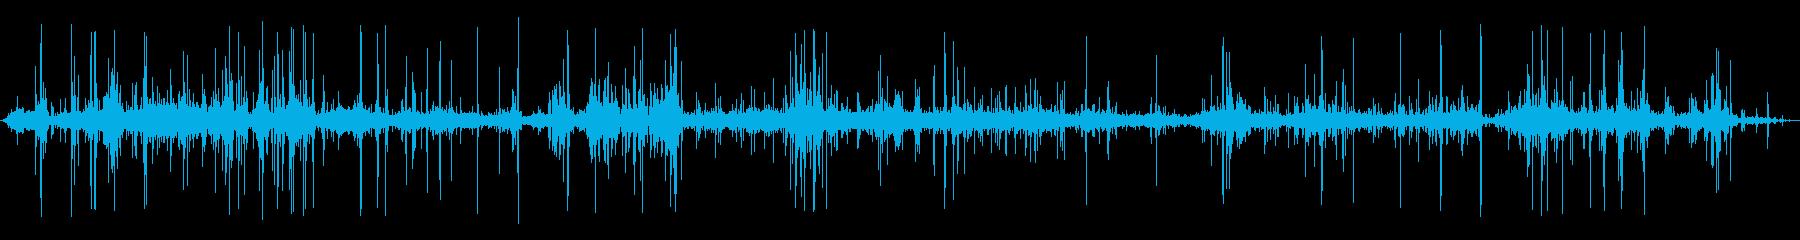 Electric Juicer M...の再生済みの波形